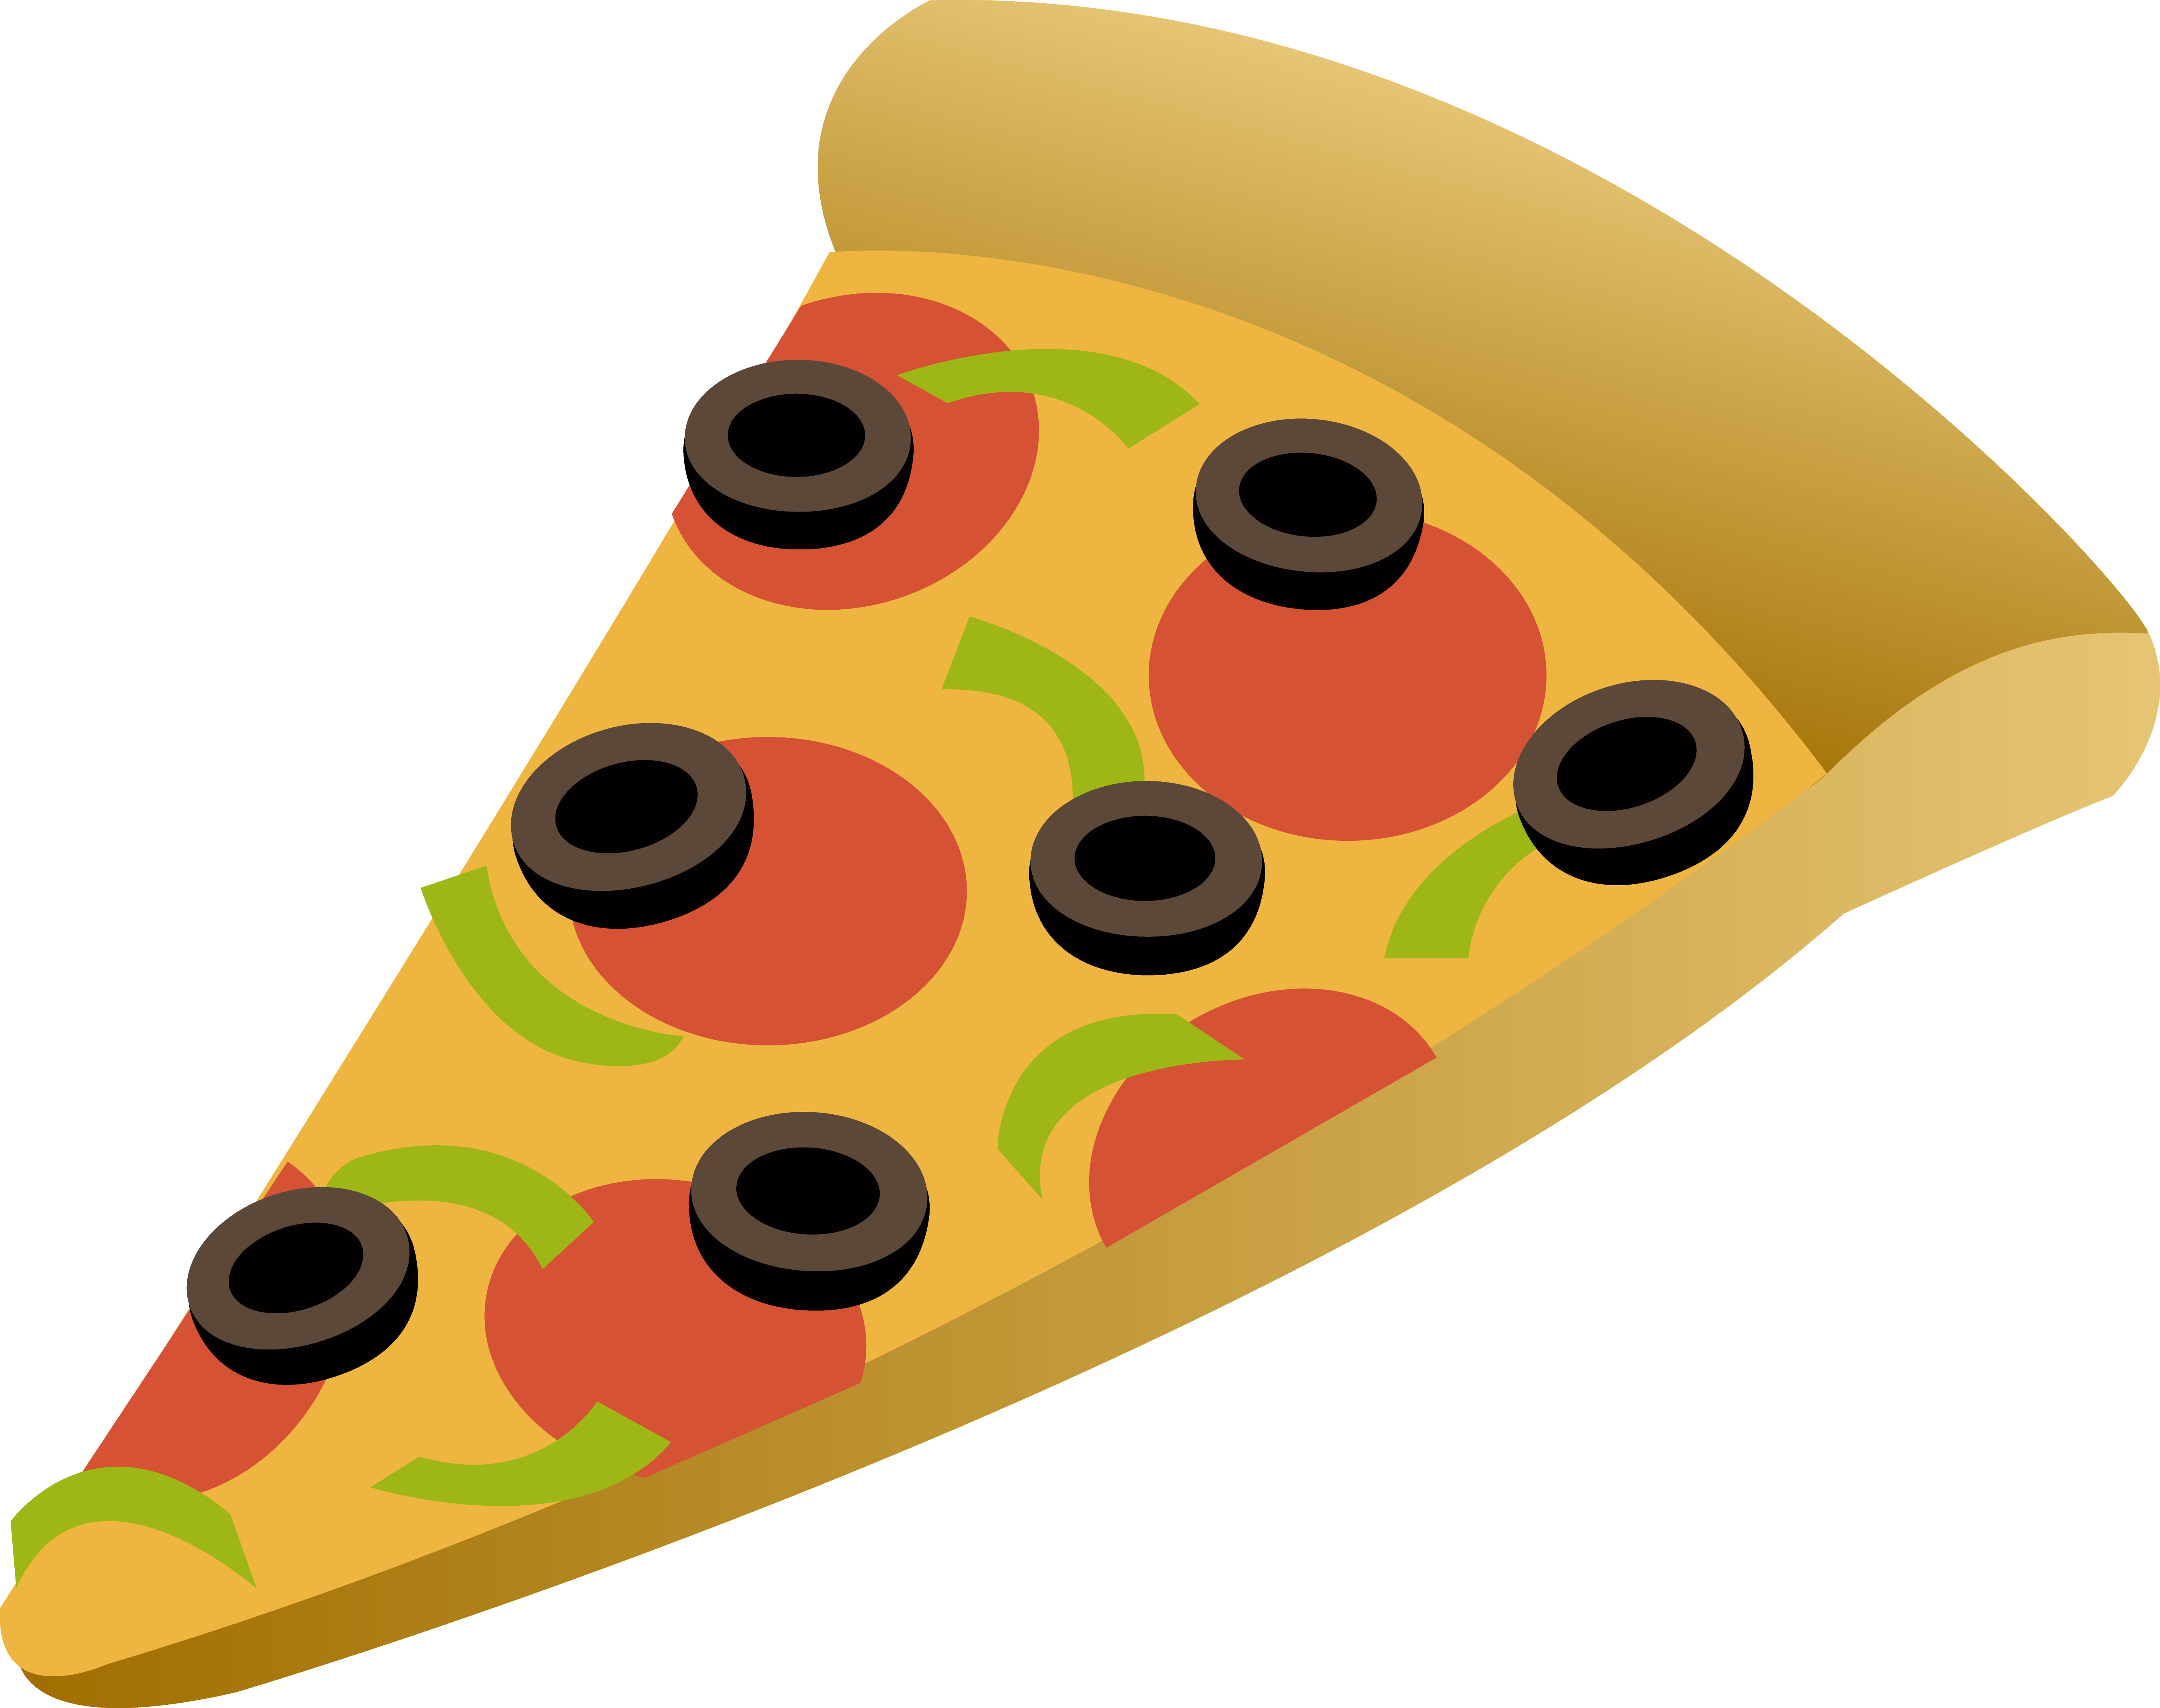 Pizza Clipart Images - Cliparts.co